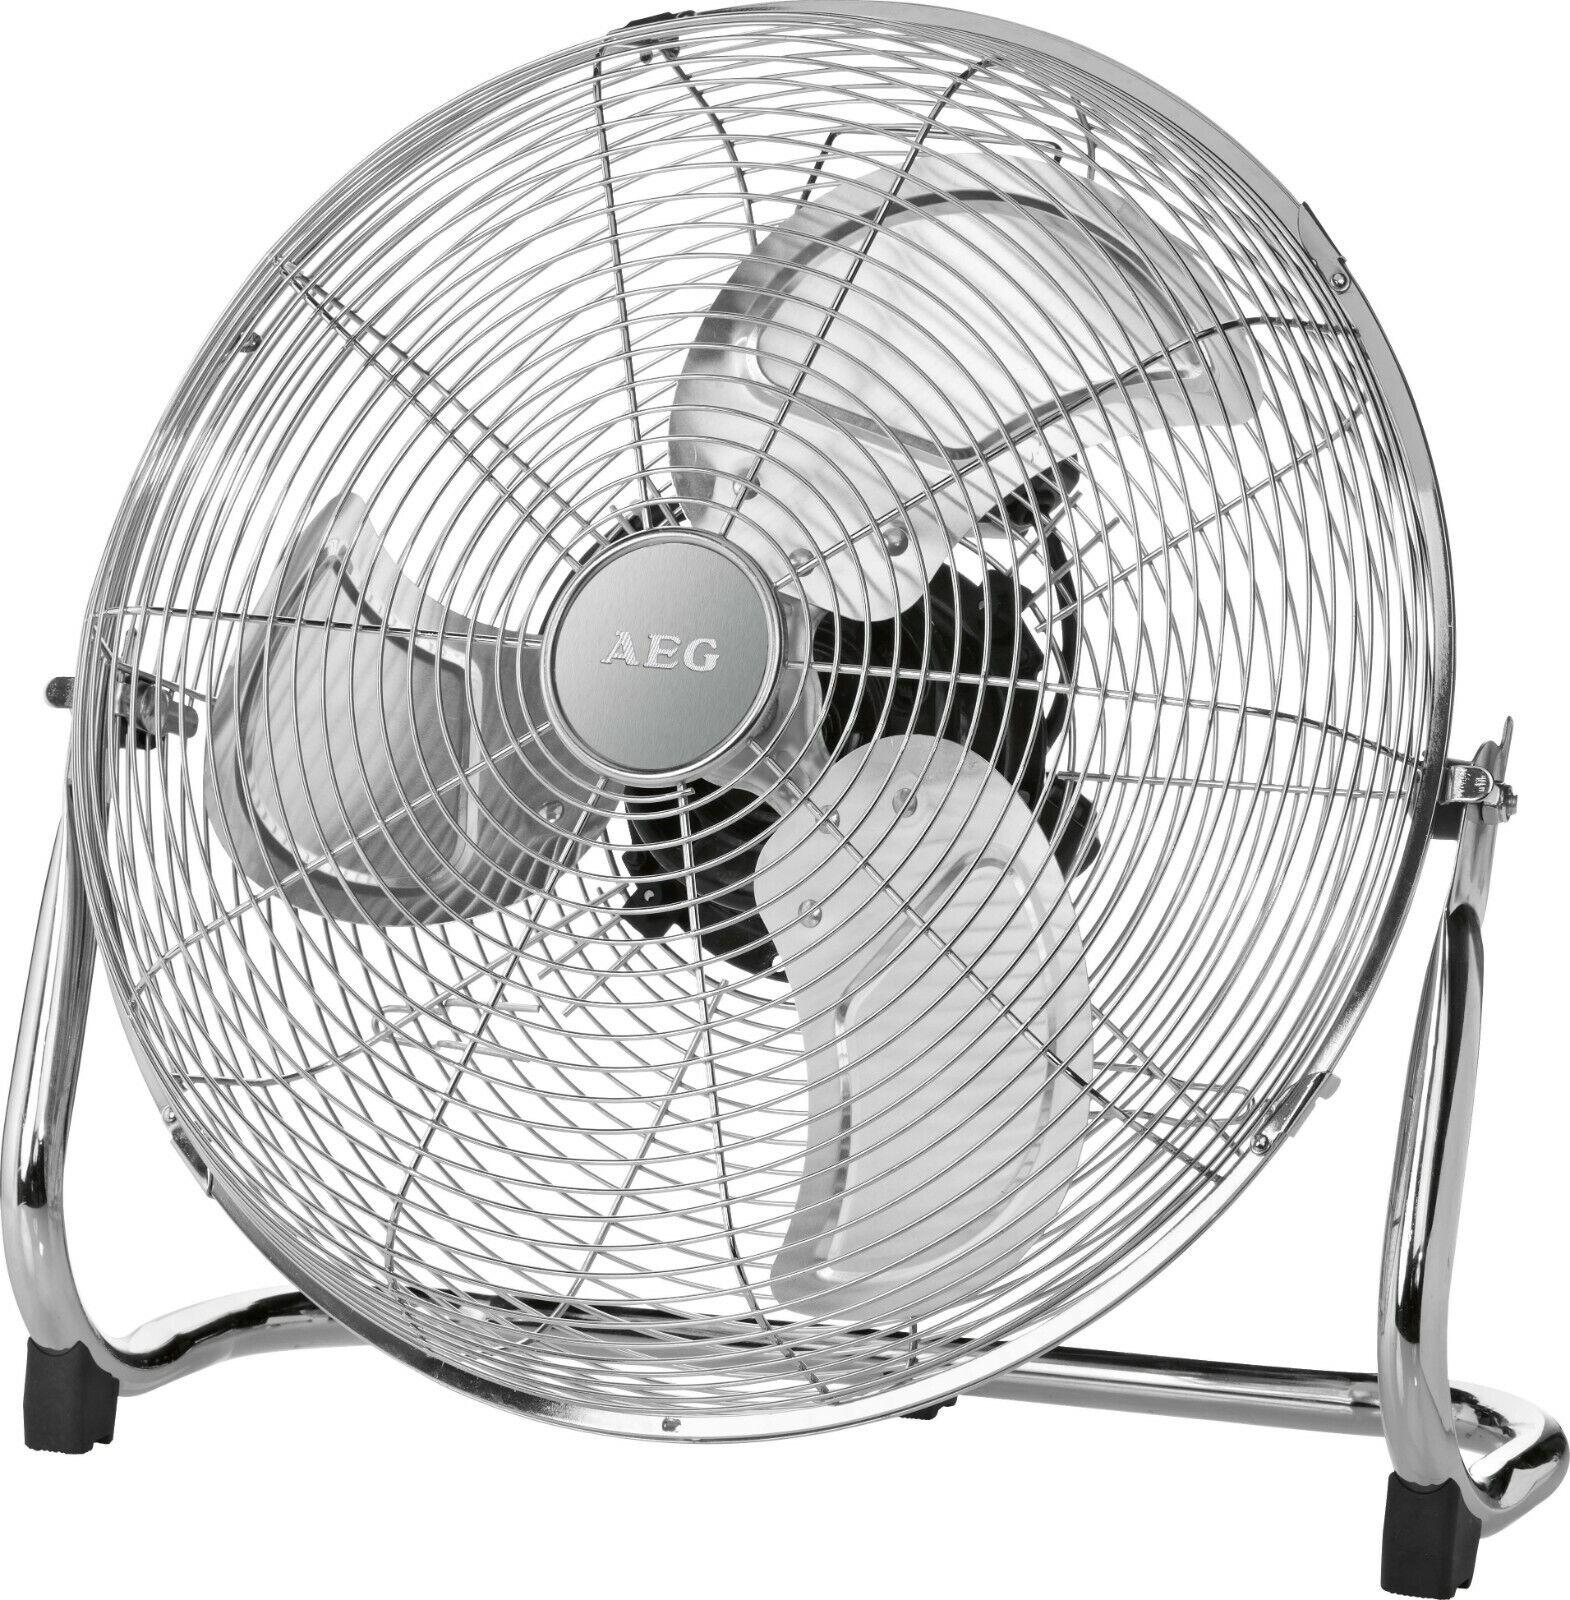 AEG VL 5606 Windmaschine / Ventilator - Metall - 100W